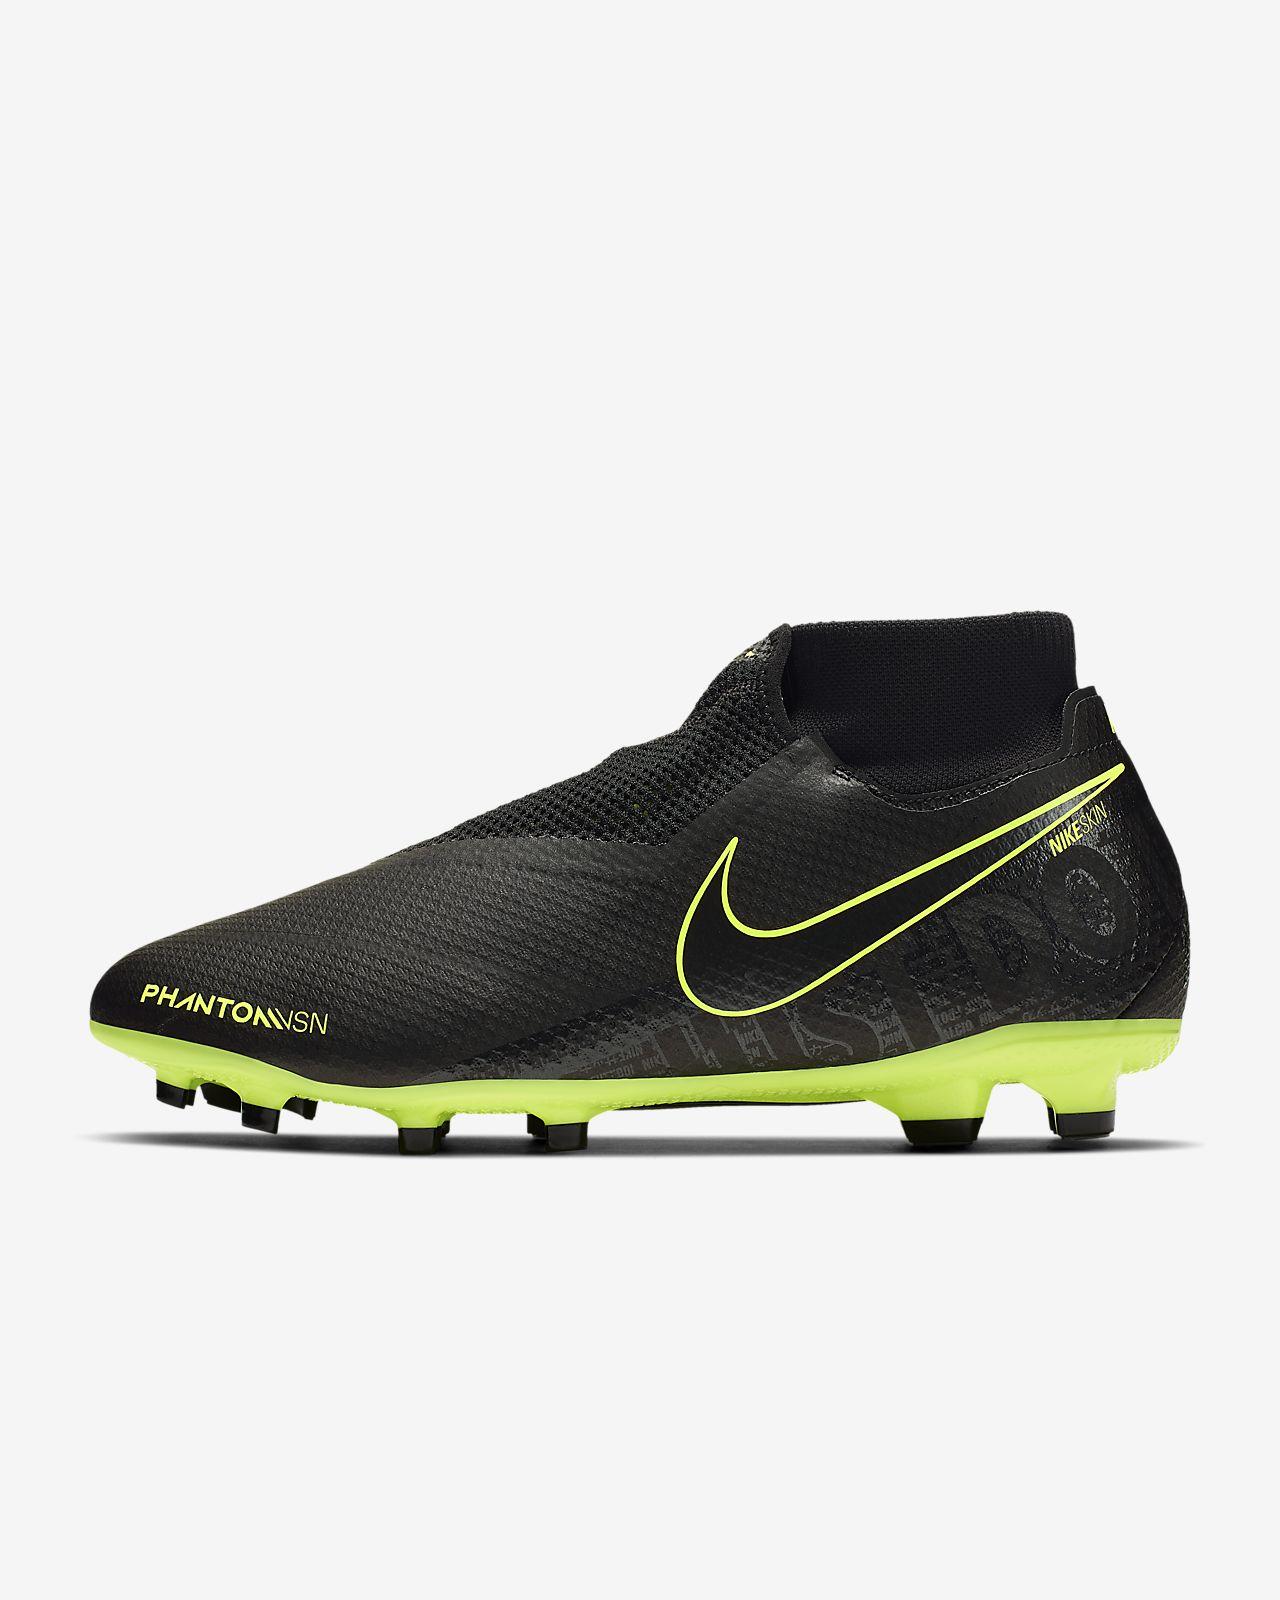 Calzado de fútbol para terreno firme Nike Phantom Vision Pro Dynamic Fit FG